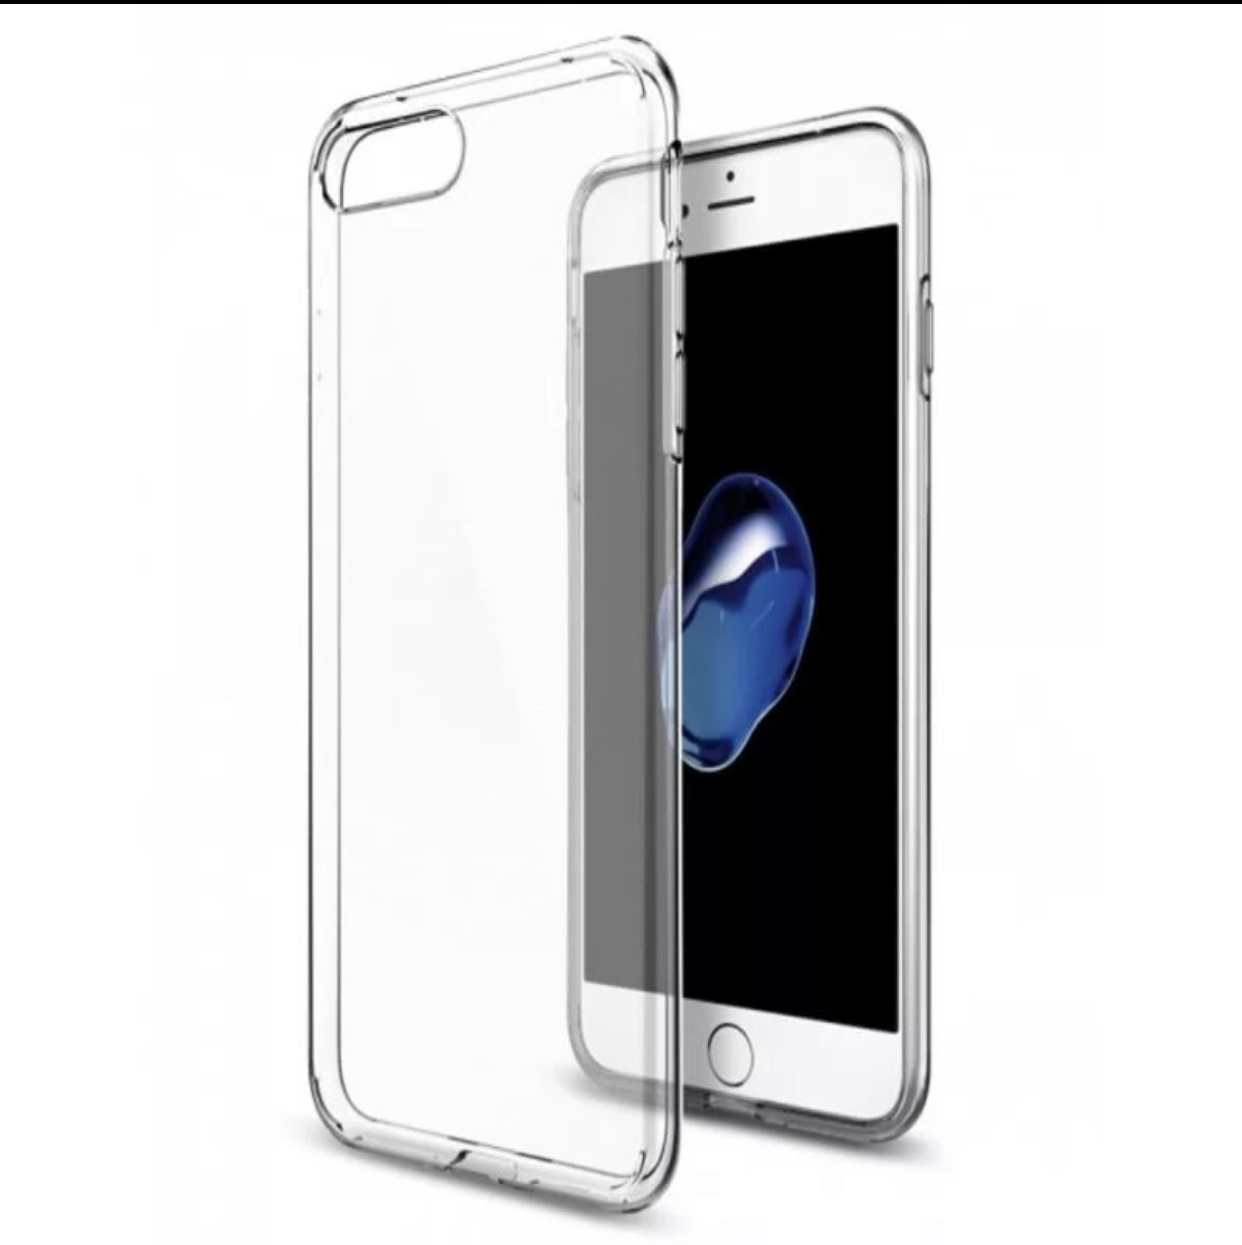 Чехол для сотового телефона Markclub@Hoco СT-2014, прозрачный